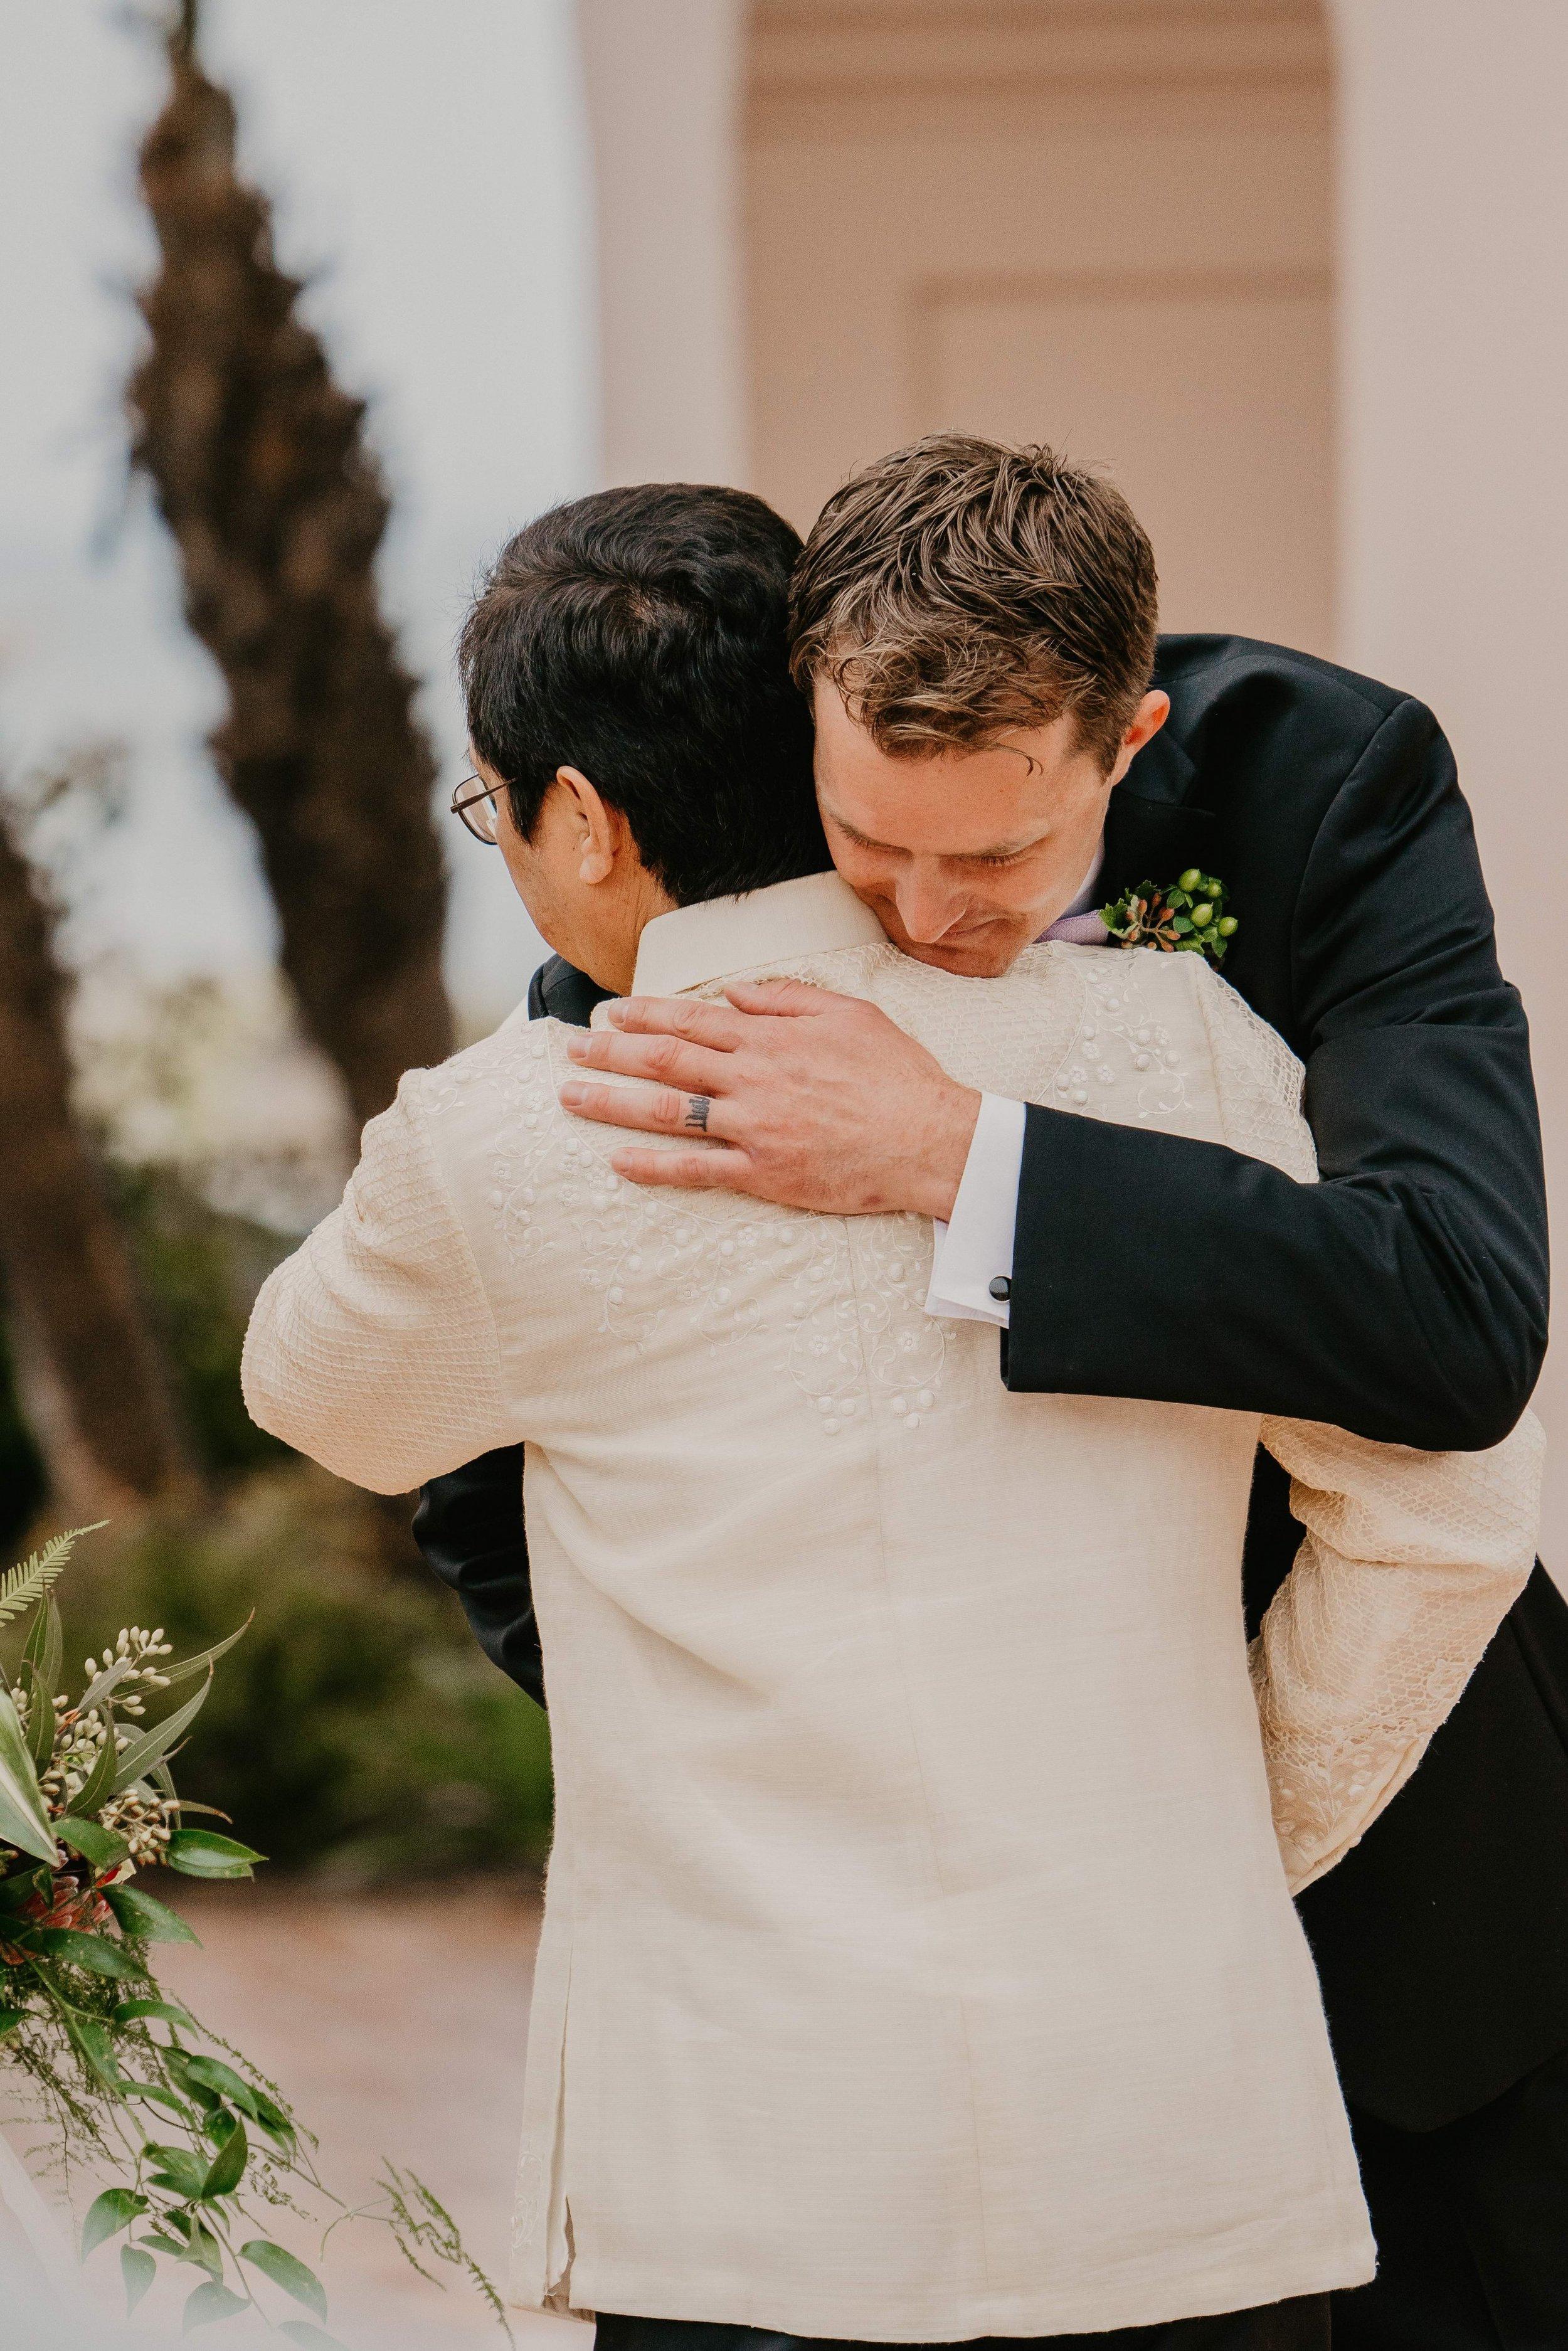 www.santabarbarawedding.com | Candice Marie Photography | Hilton Santa Barbara Beachfront Resort | Dalina Klan | Once in a Lifetime Weddings | Anthony Francisco | Groom Hugs Bride's Father